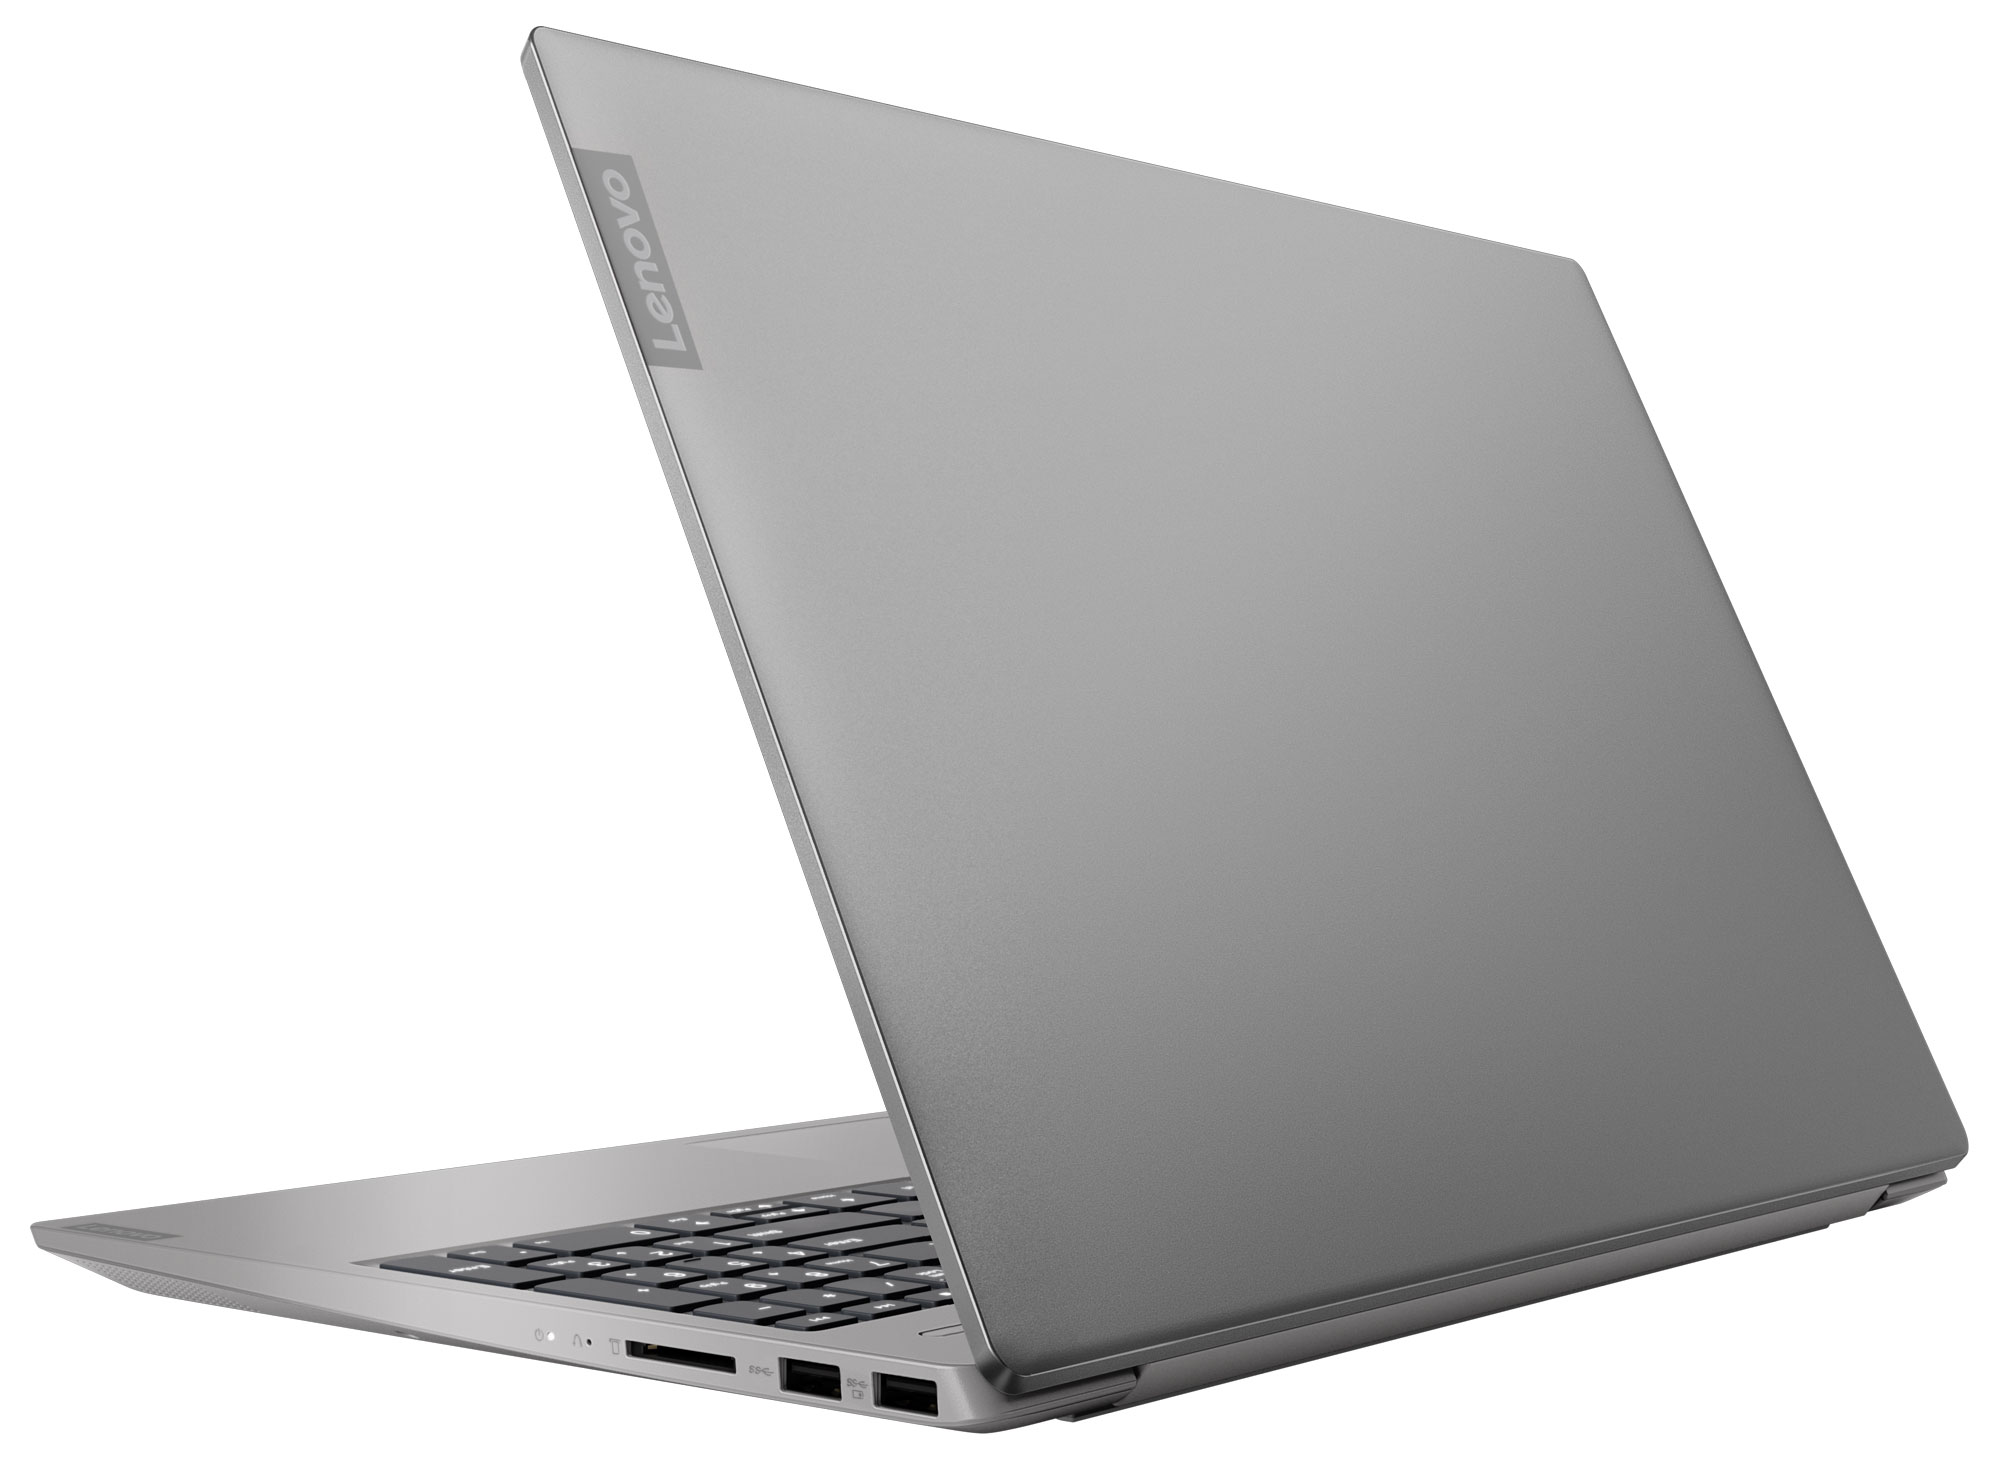 Фото  Ноутбук Lenovo ideapad S340-15IWL Platinum Grey (81N800B7RE)